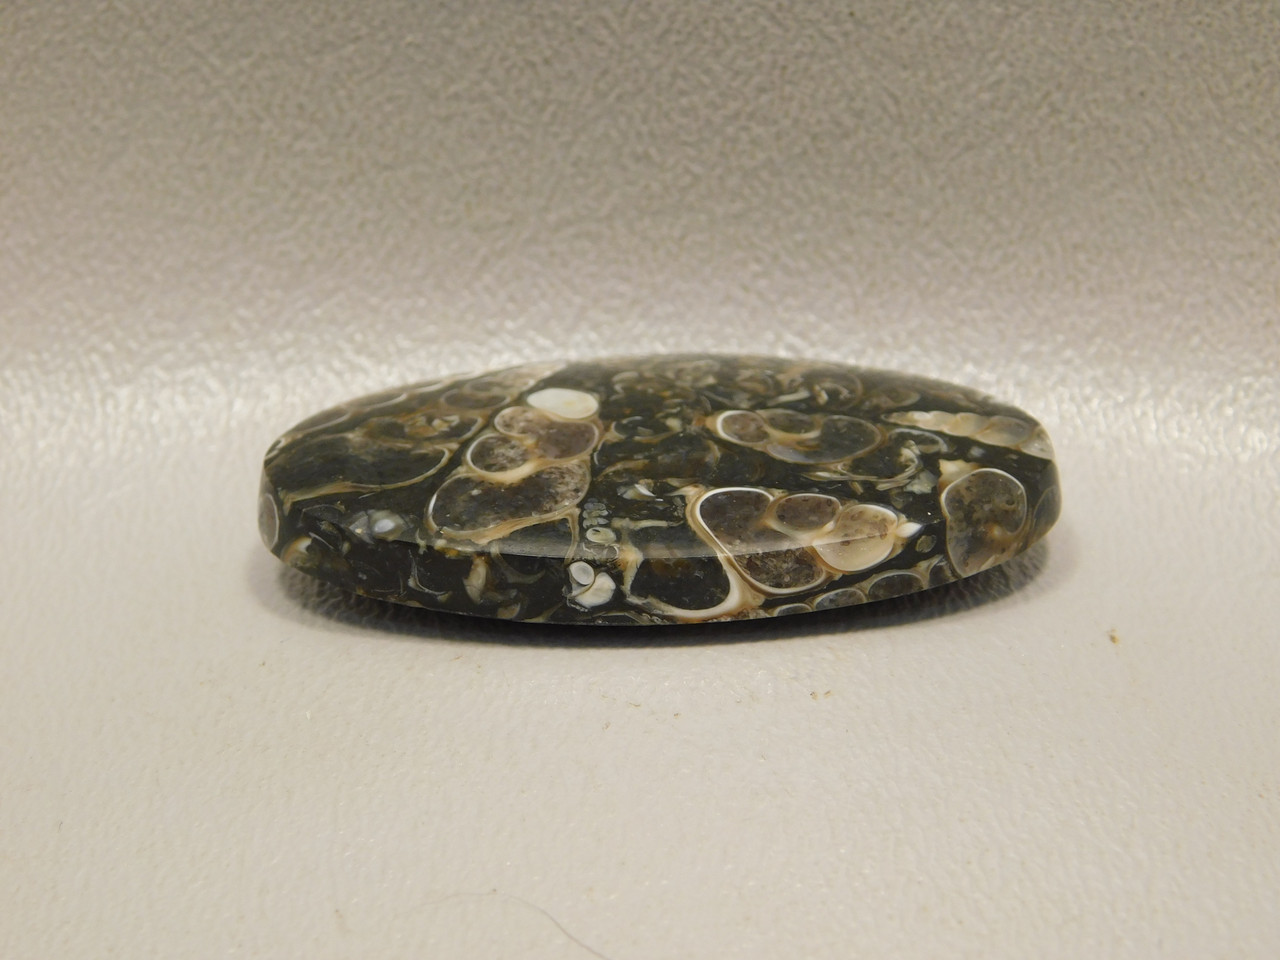 Turritella Agate Wyoming Gemstone Fossil Cabochon #2